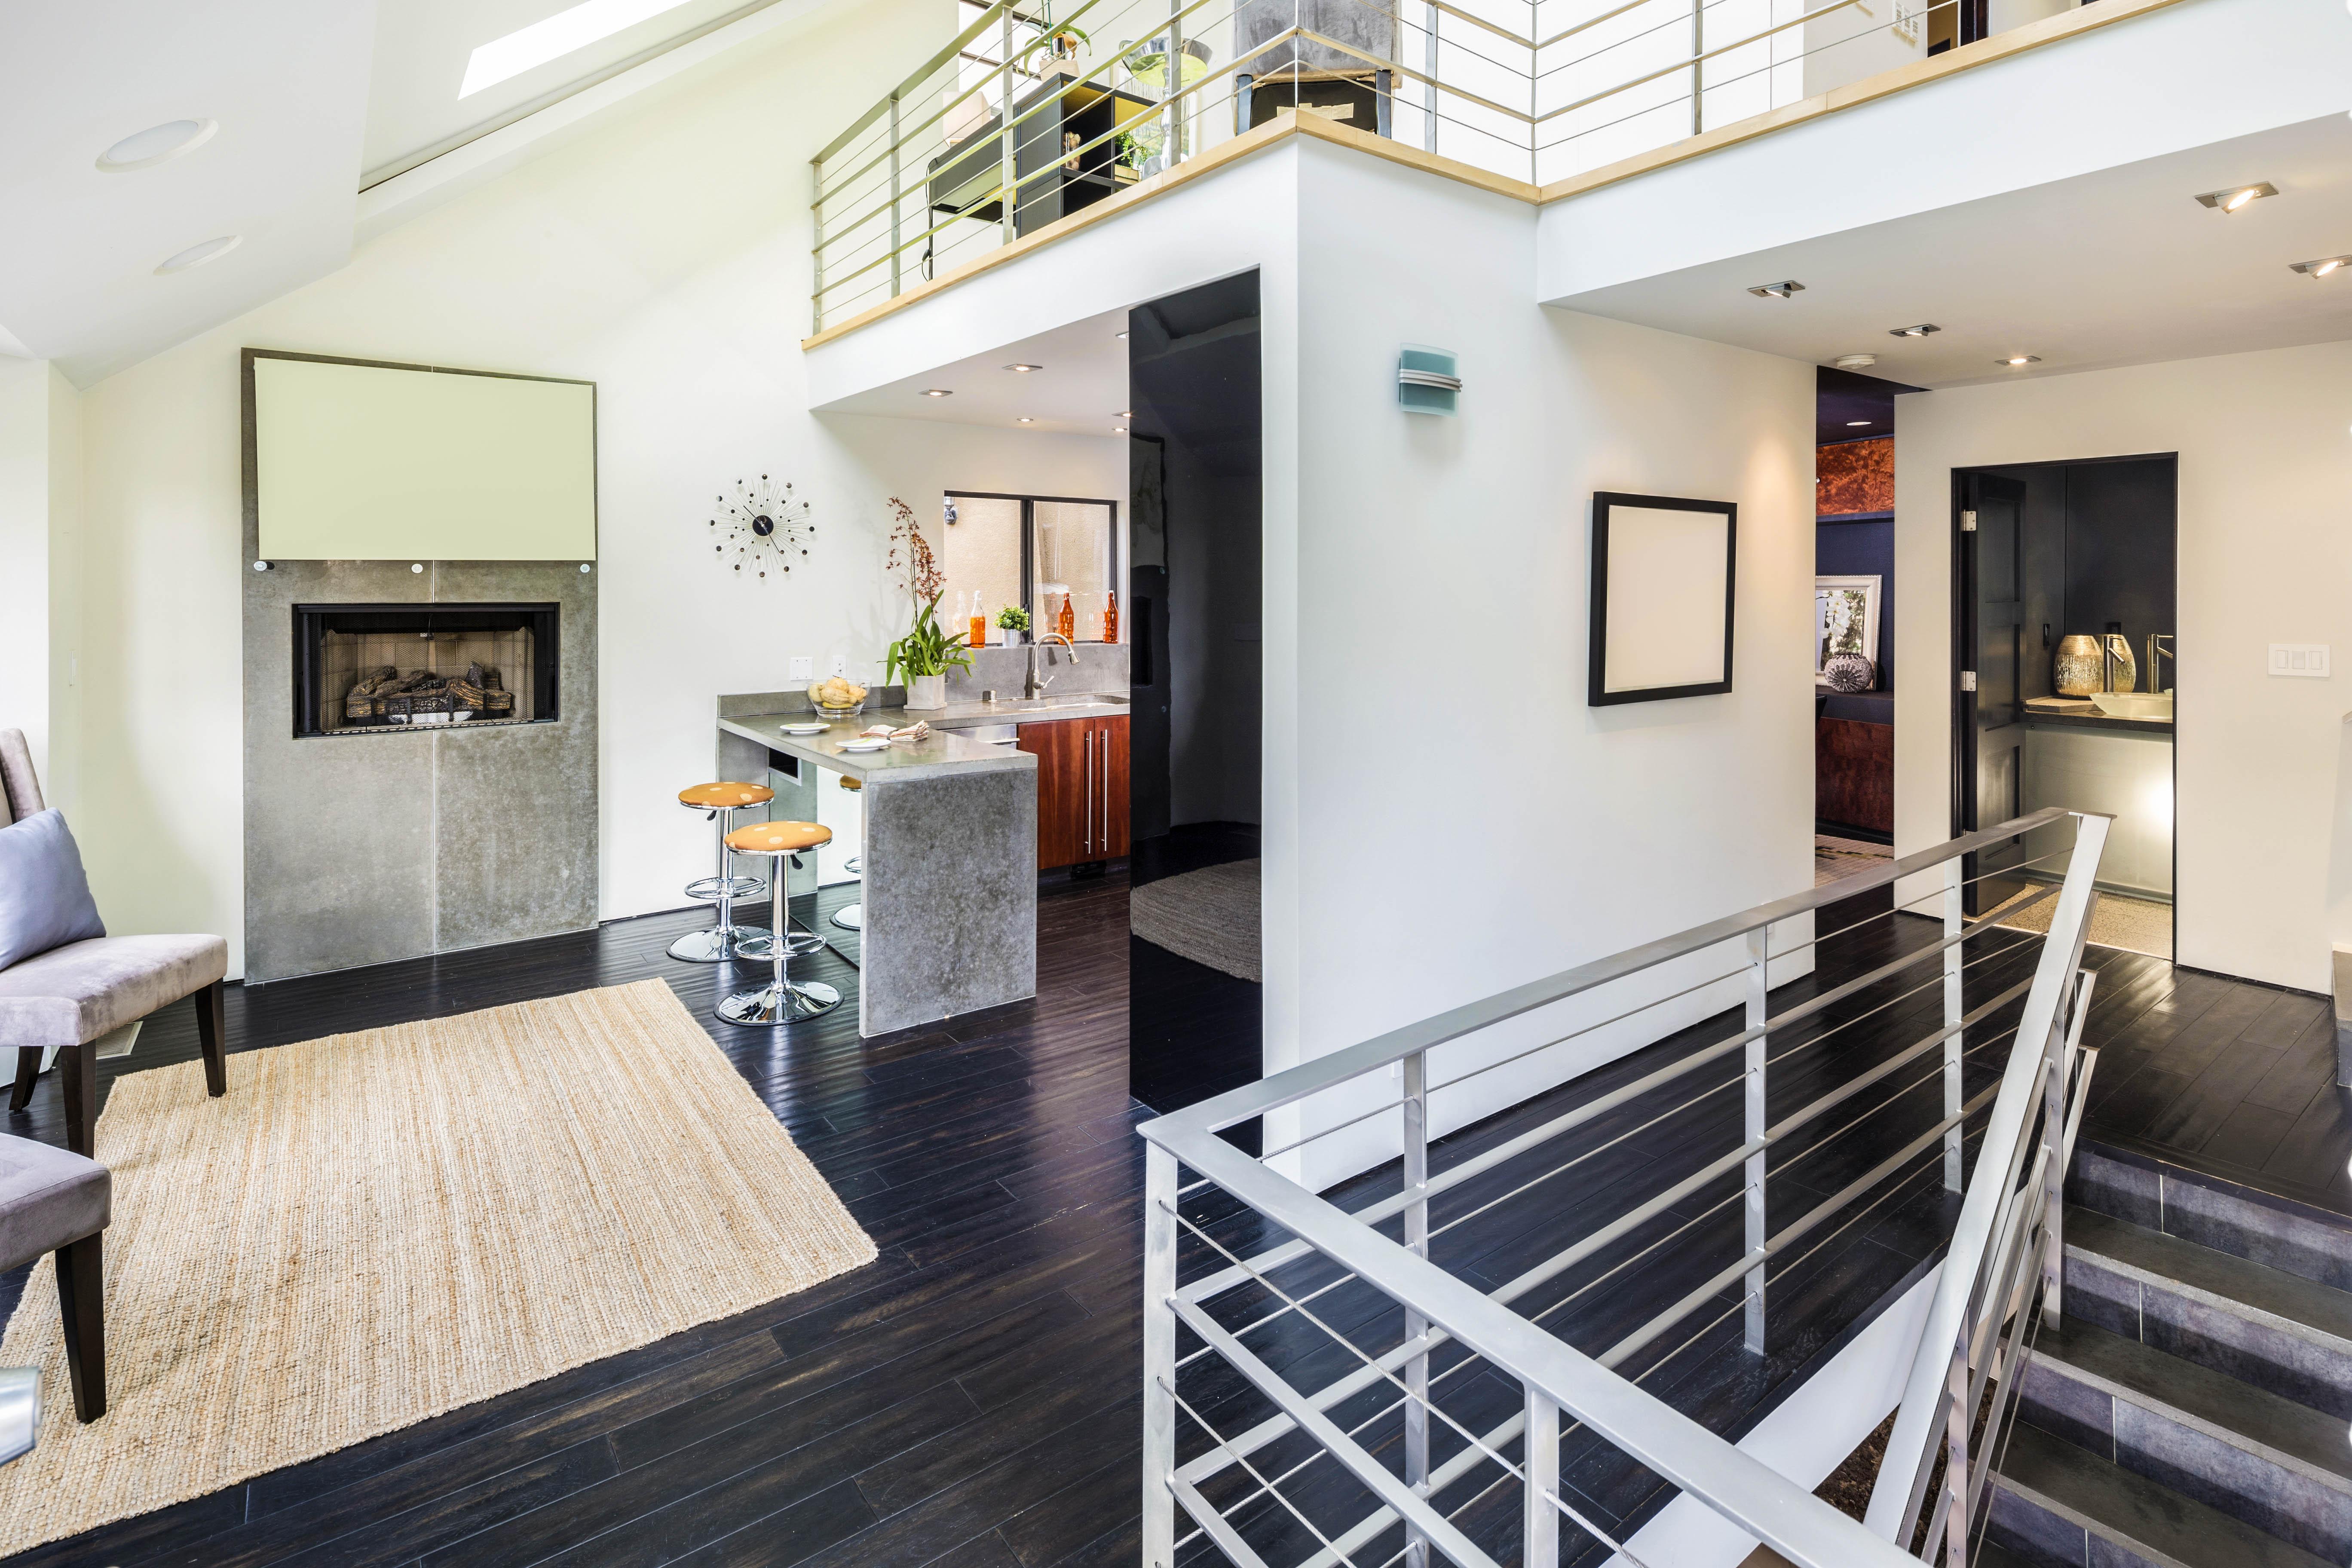 ferienwohnungen in berlin verboten. Black Bedroom Furniture Sets. Home Design Ideas